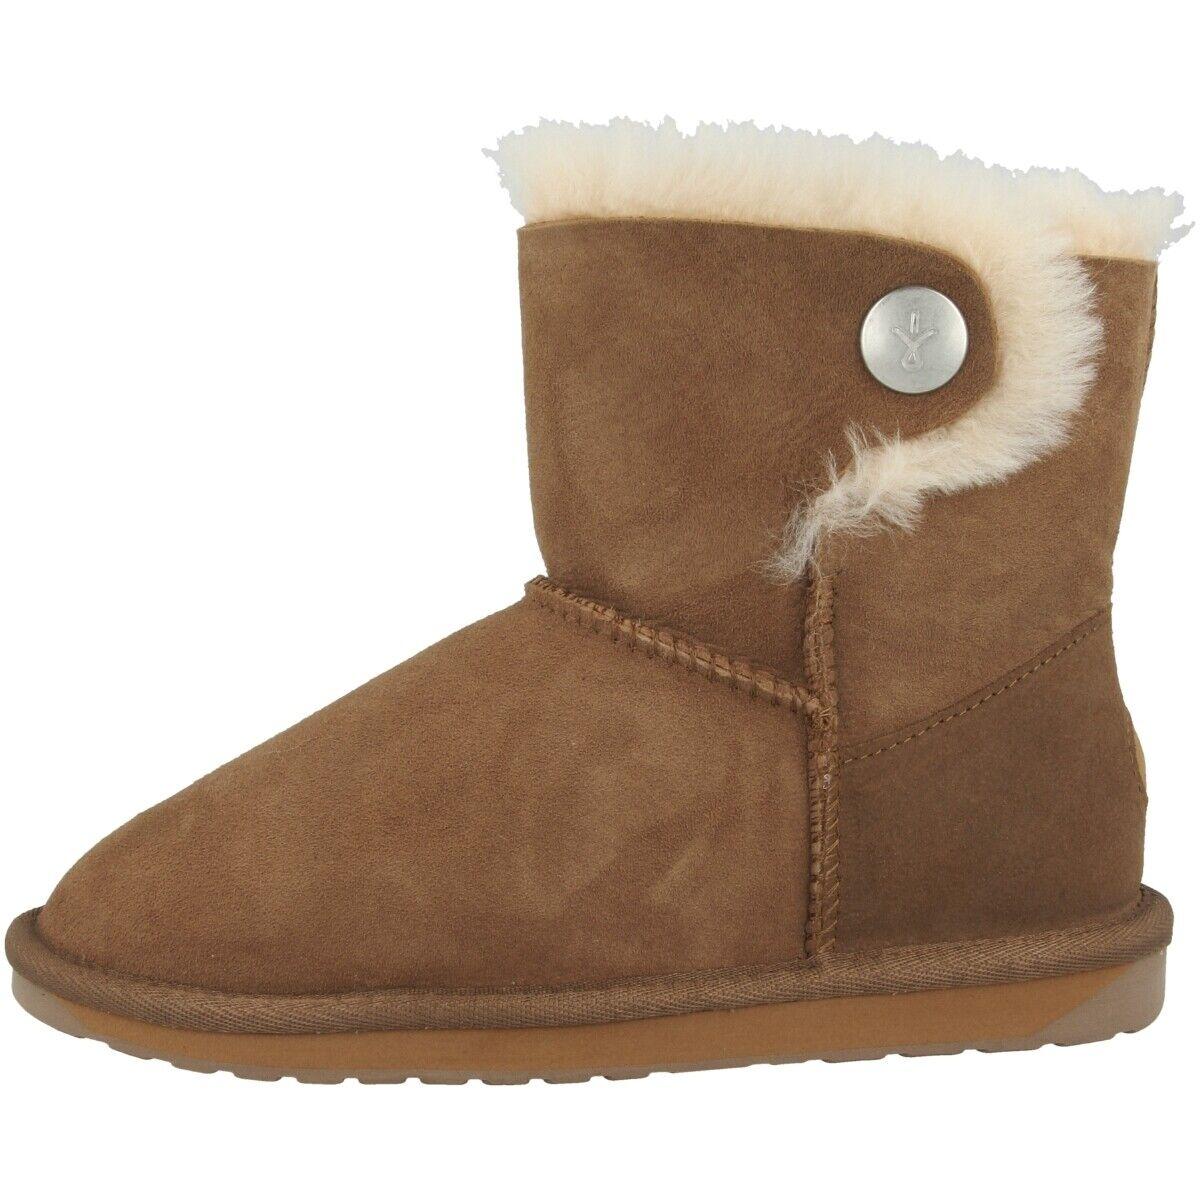 EMU Australia Ore damen Damen Schuhe Stiefel Freizeit Lammfell Stiefel W11788-E012